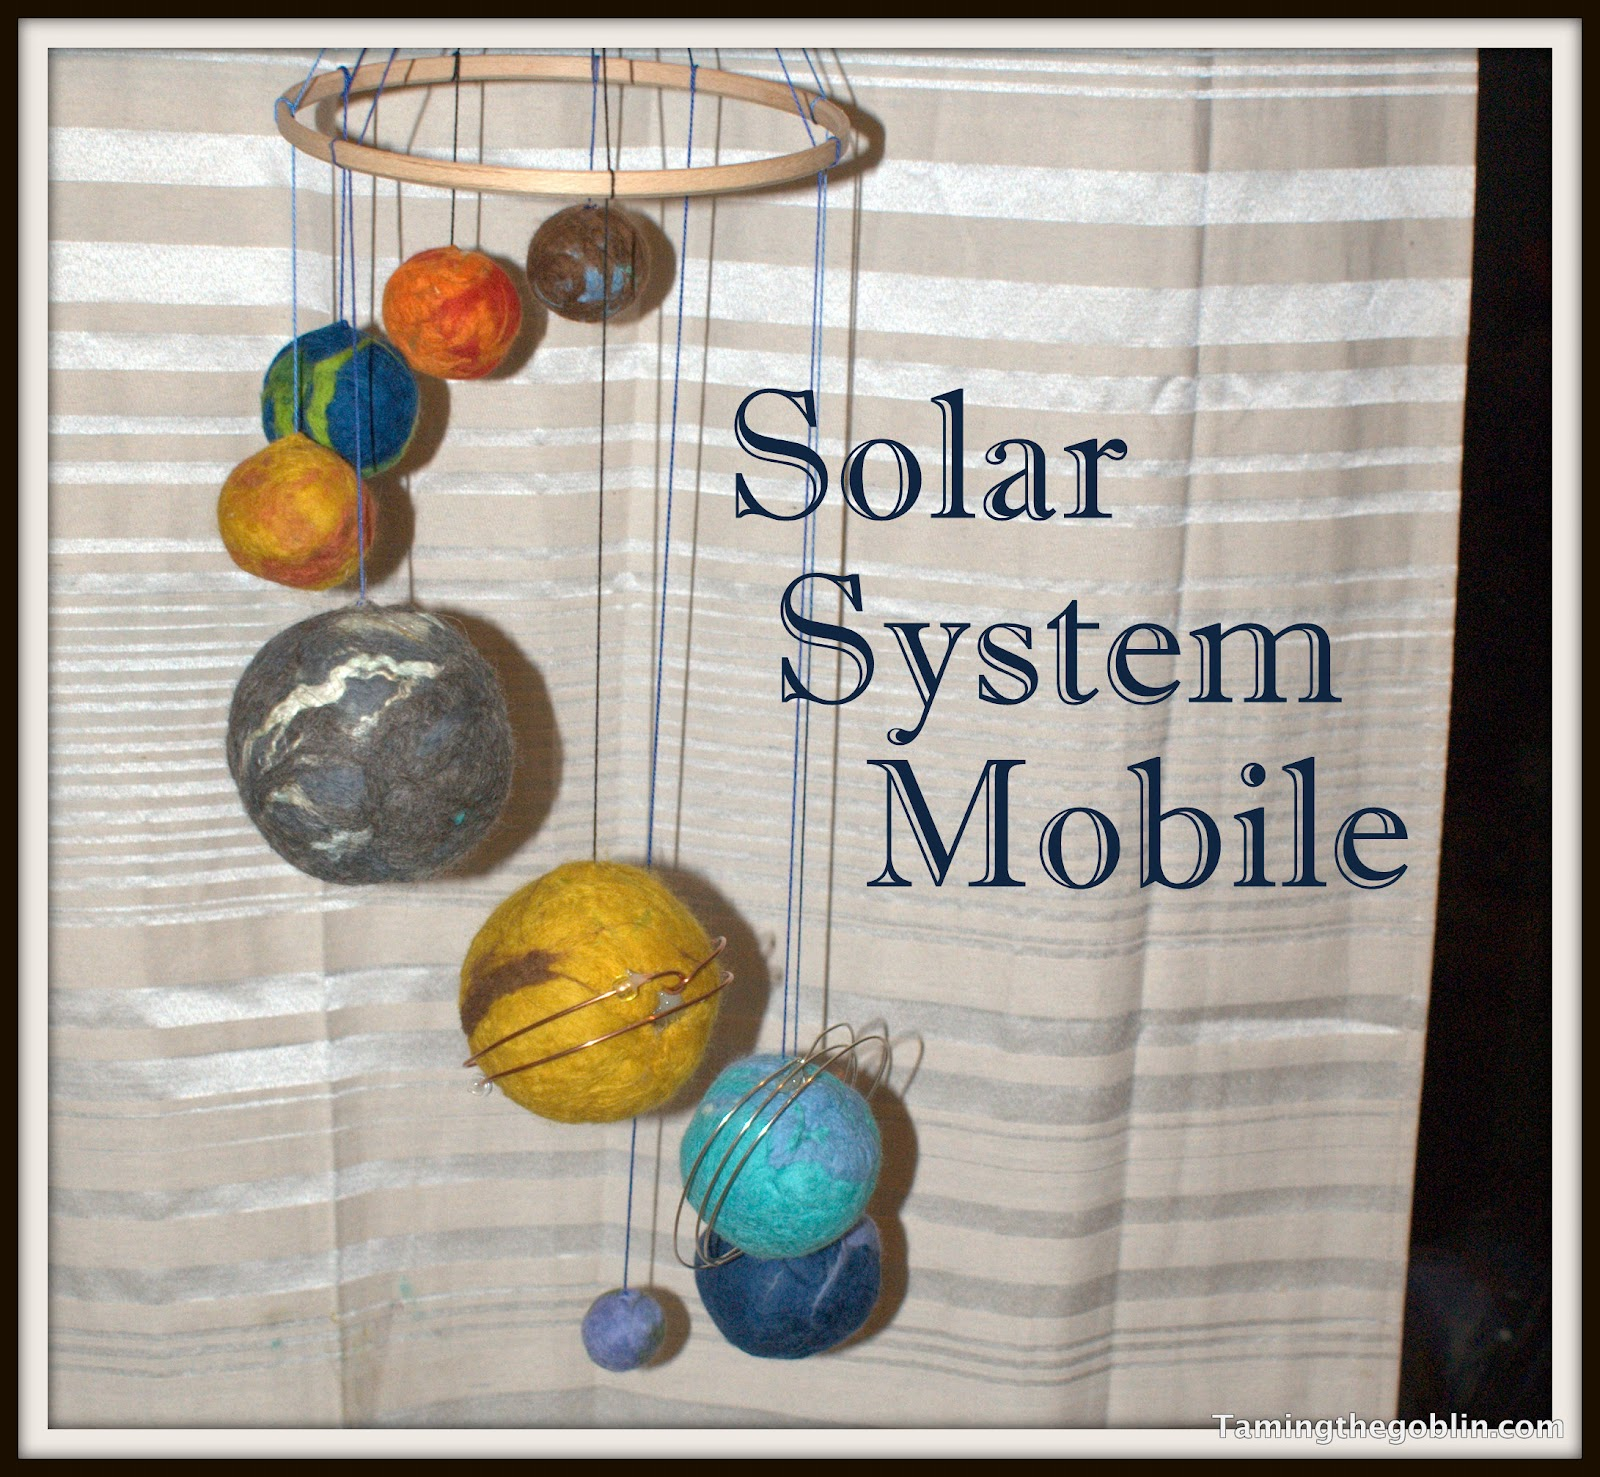 Taming the goblin solar system mobile